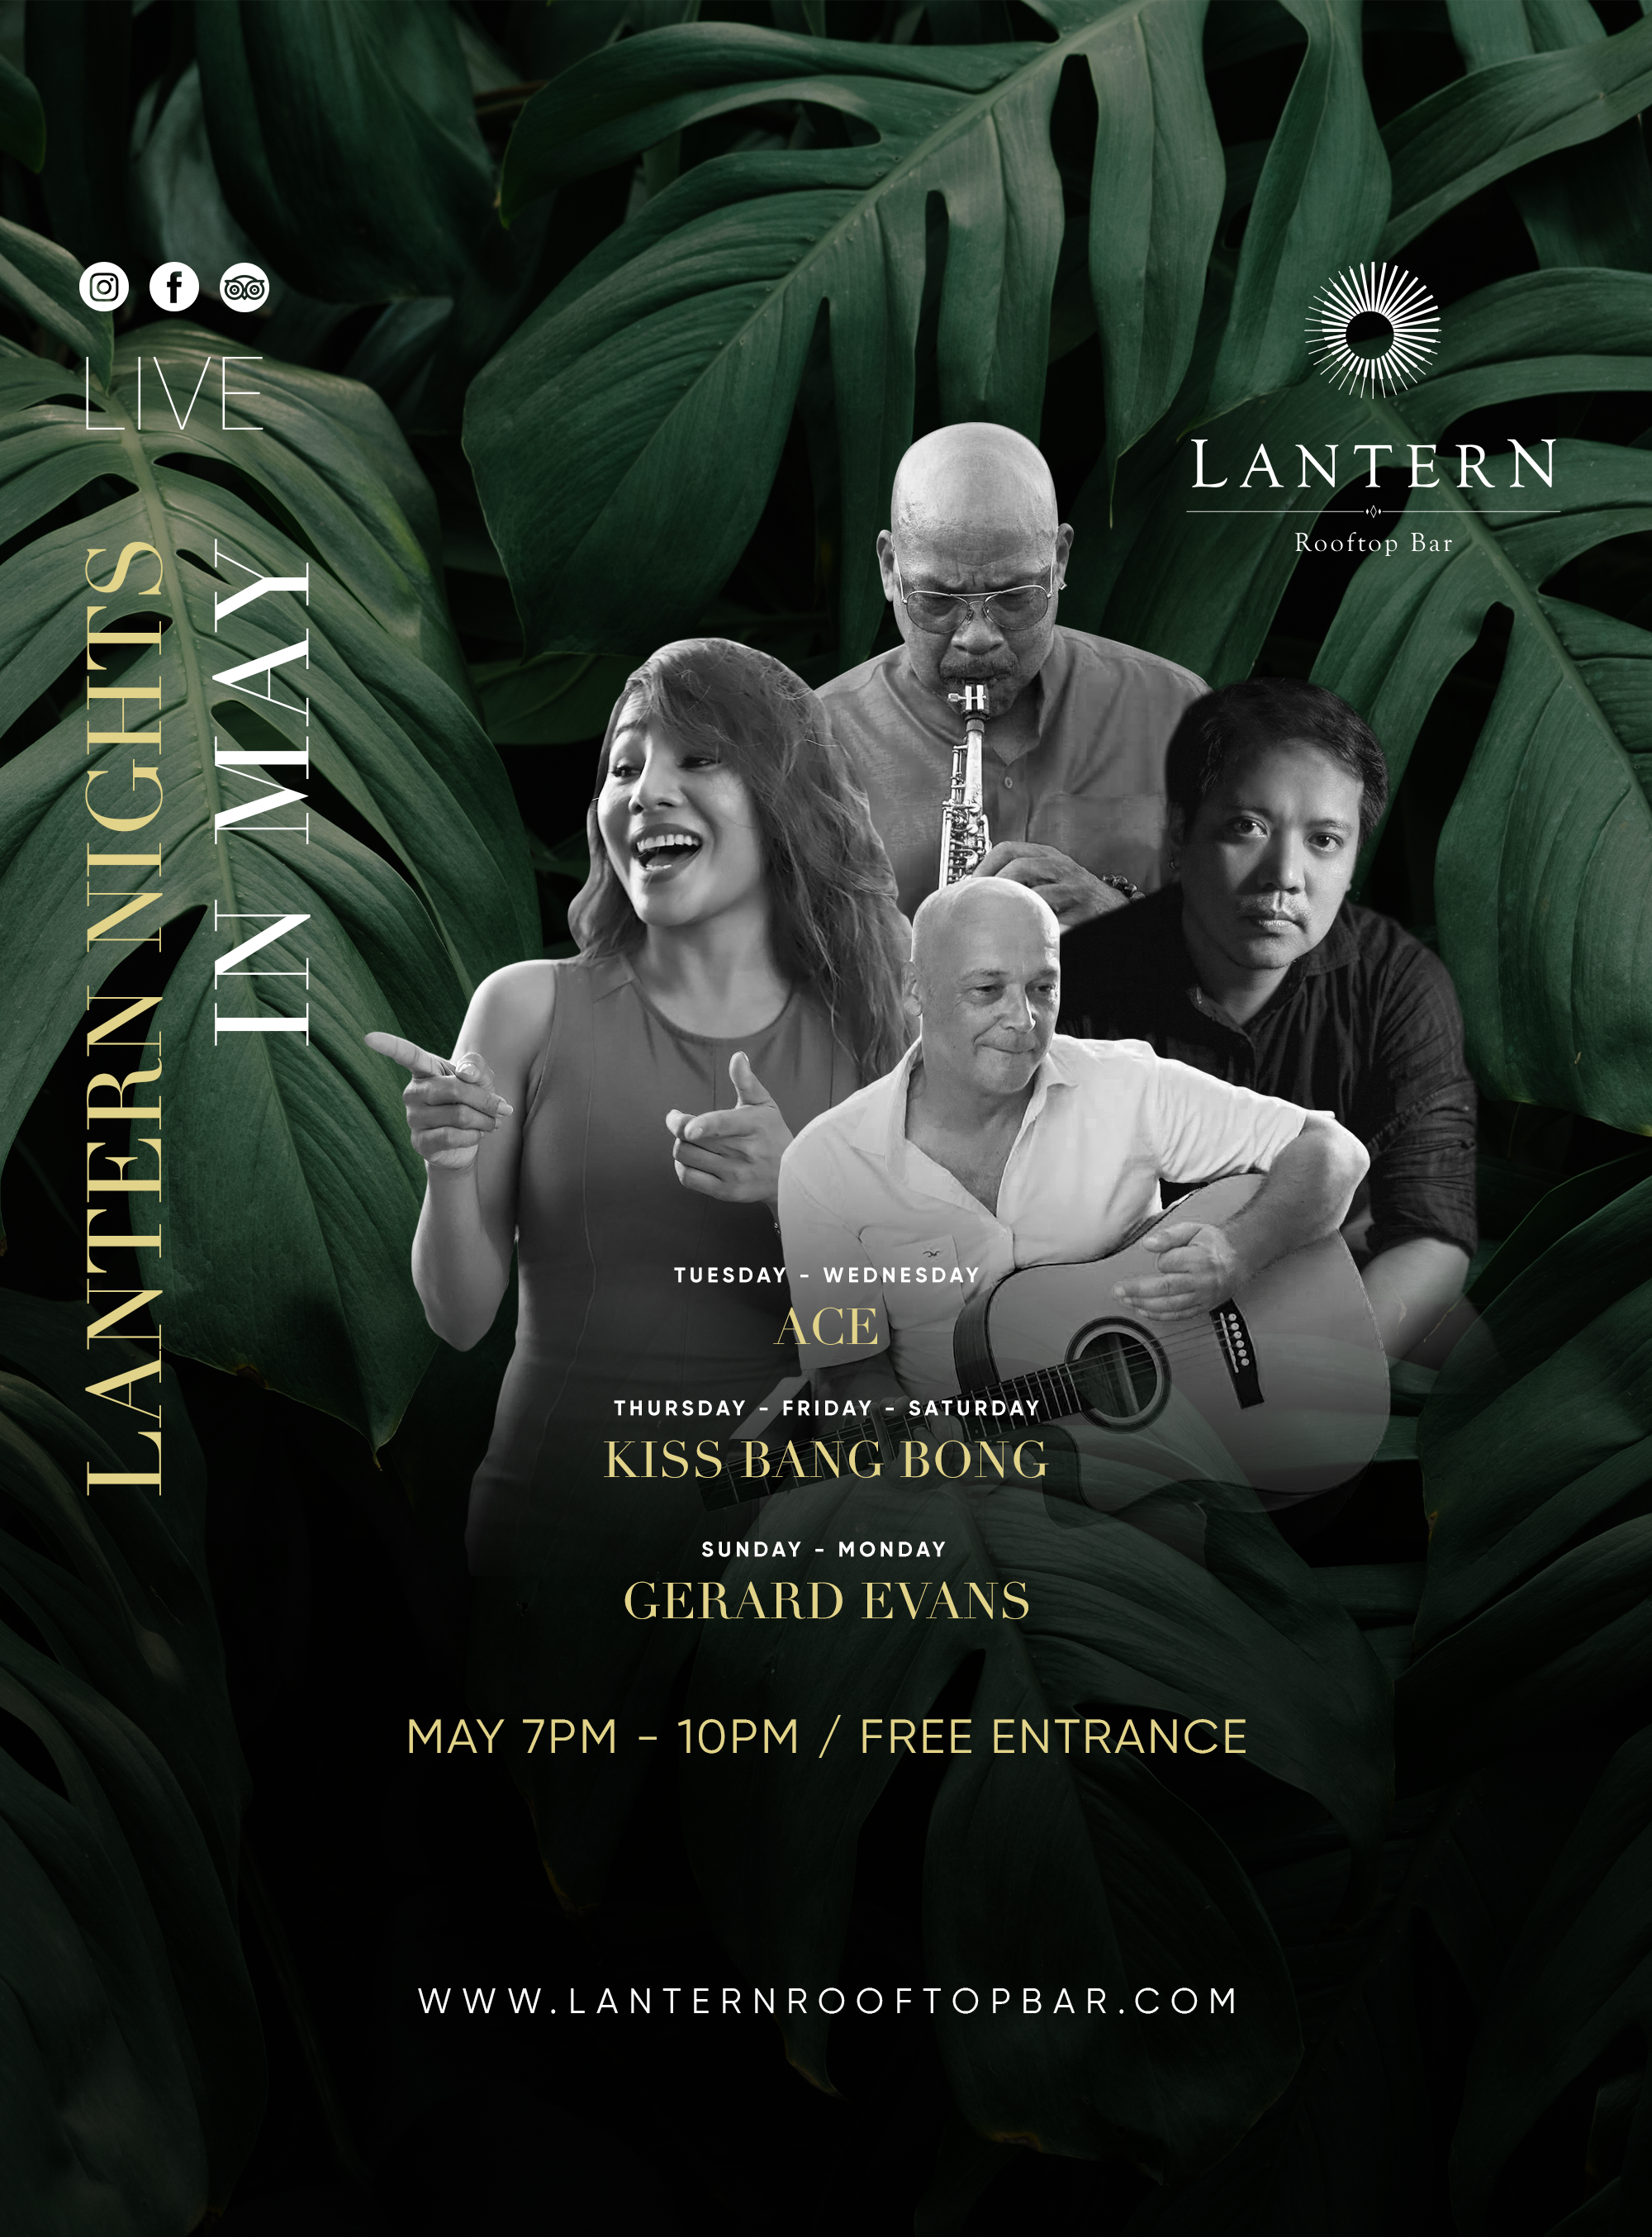 May Lantern Nights – Live music 7 days a week!